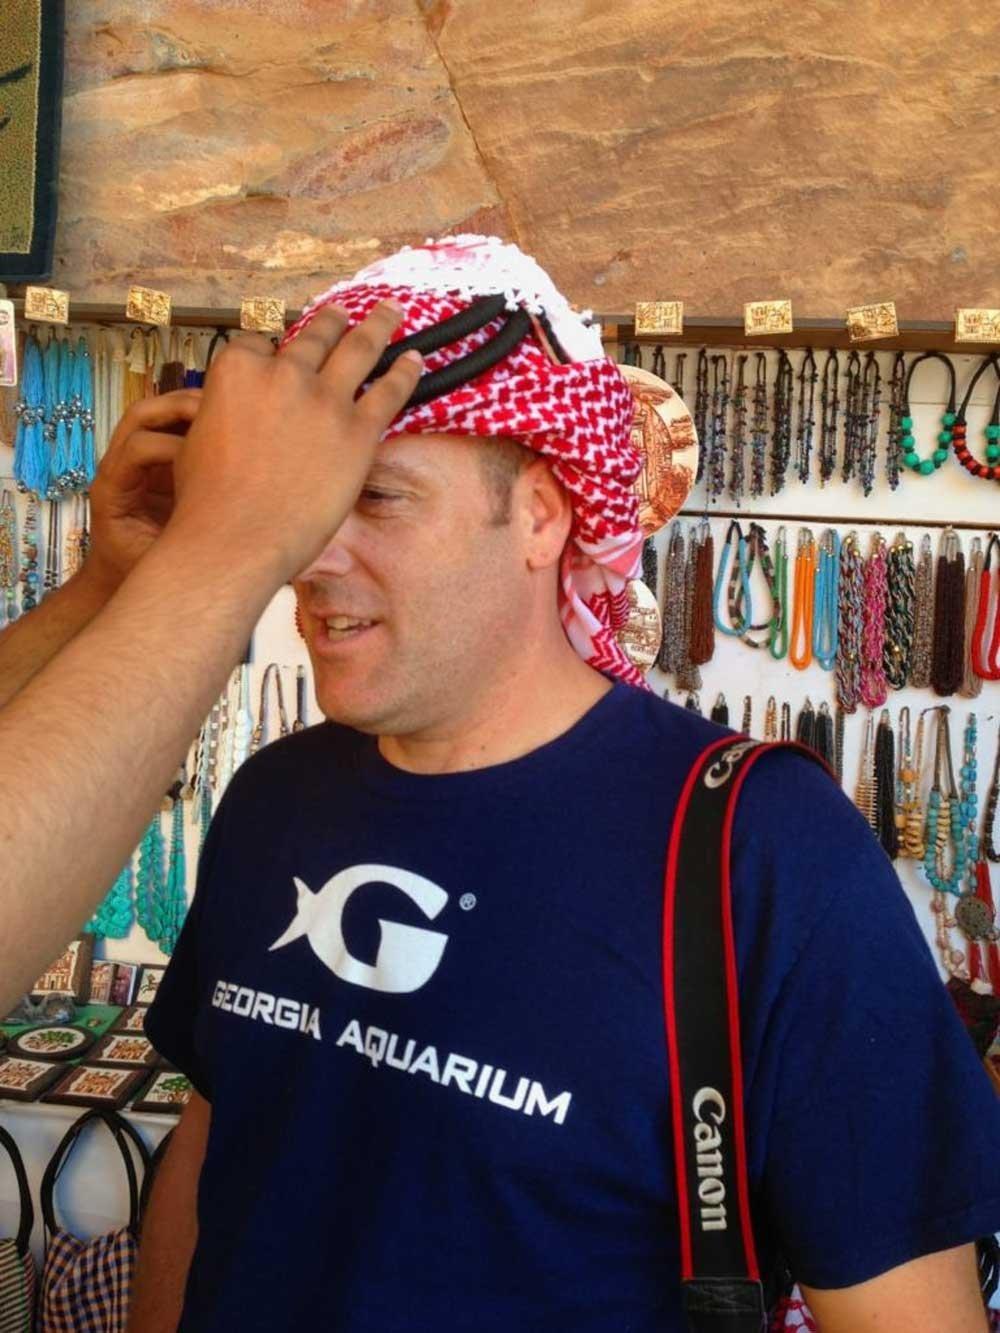 Travel attitude: Traditional Jordanian head scarf